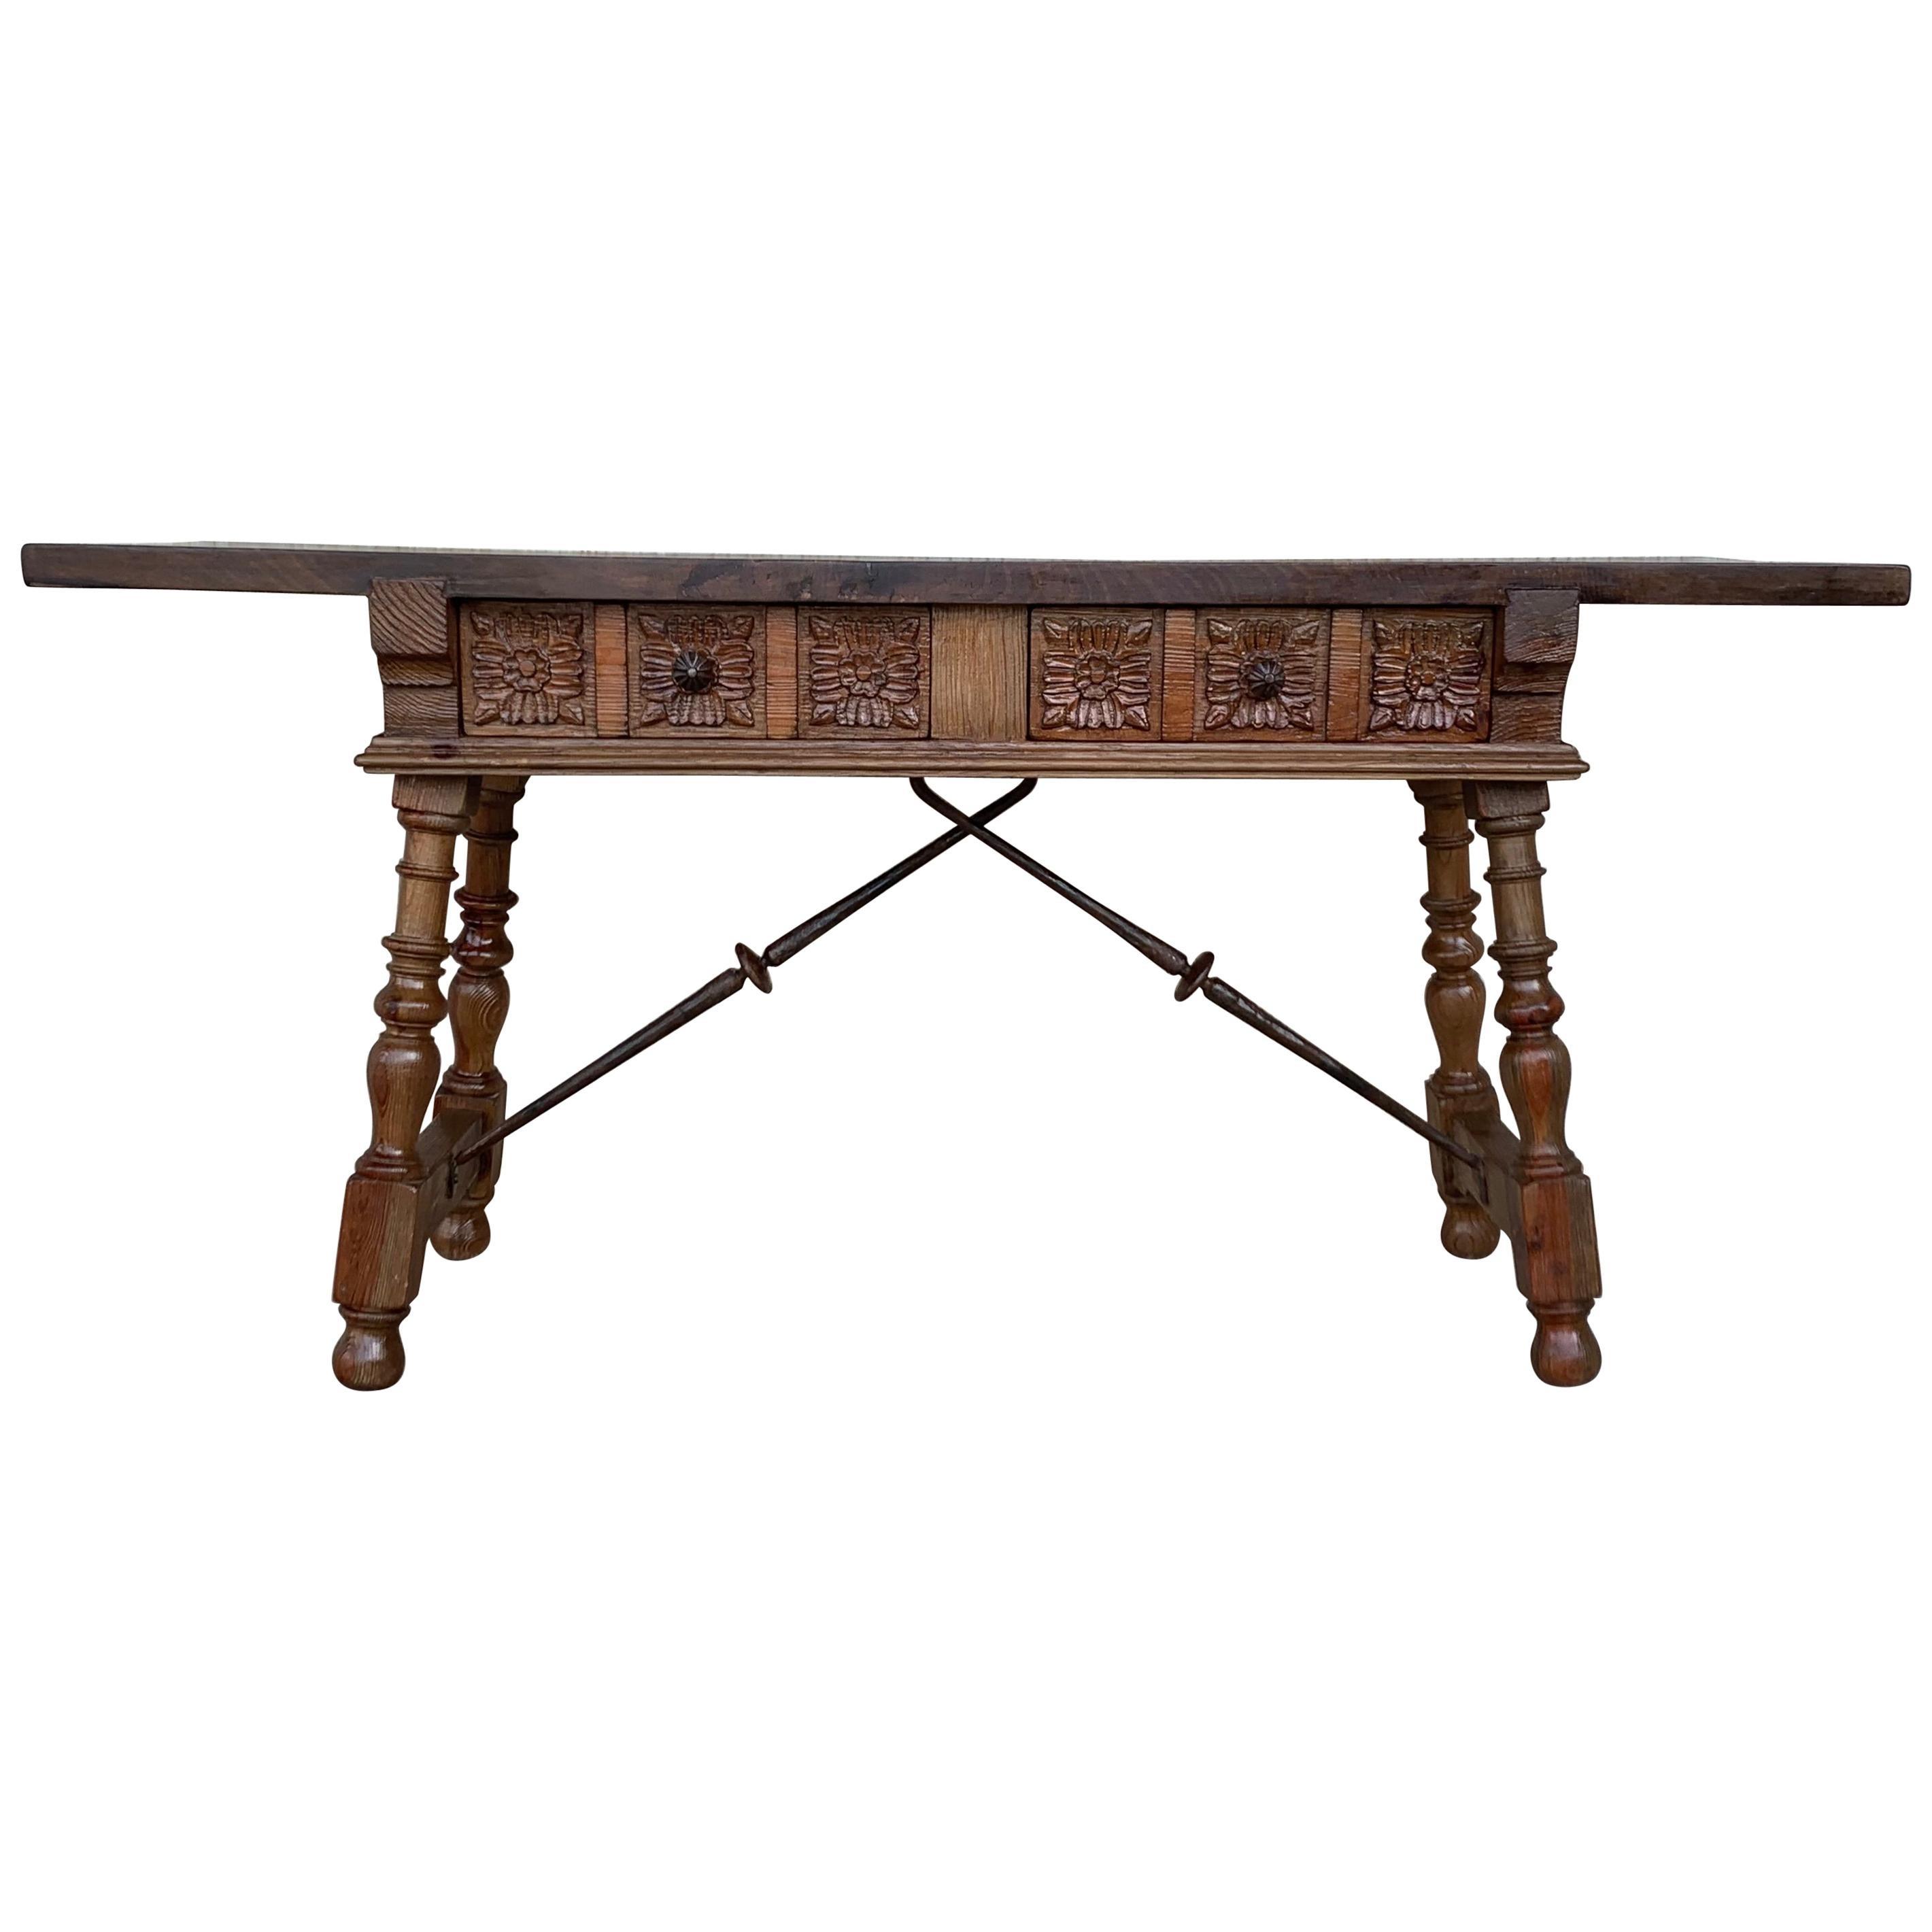 19th Century Catalan Spanish Baroque Walnut Trestle Console Table, Restored